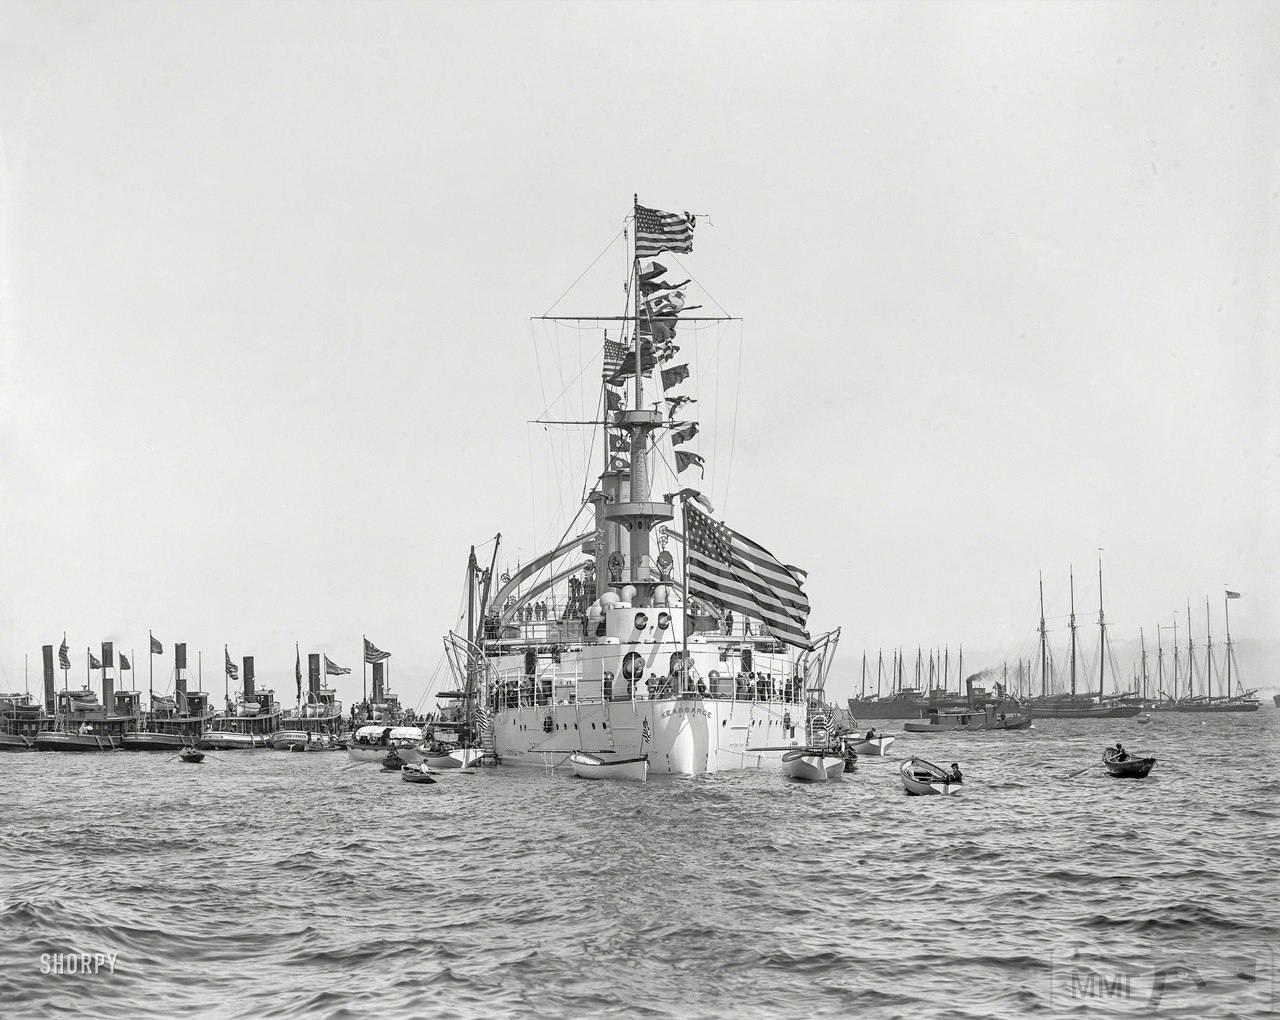 18796 - US NAVY